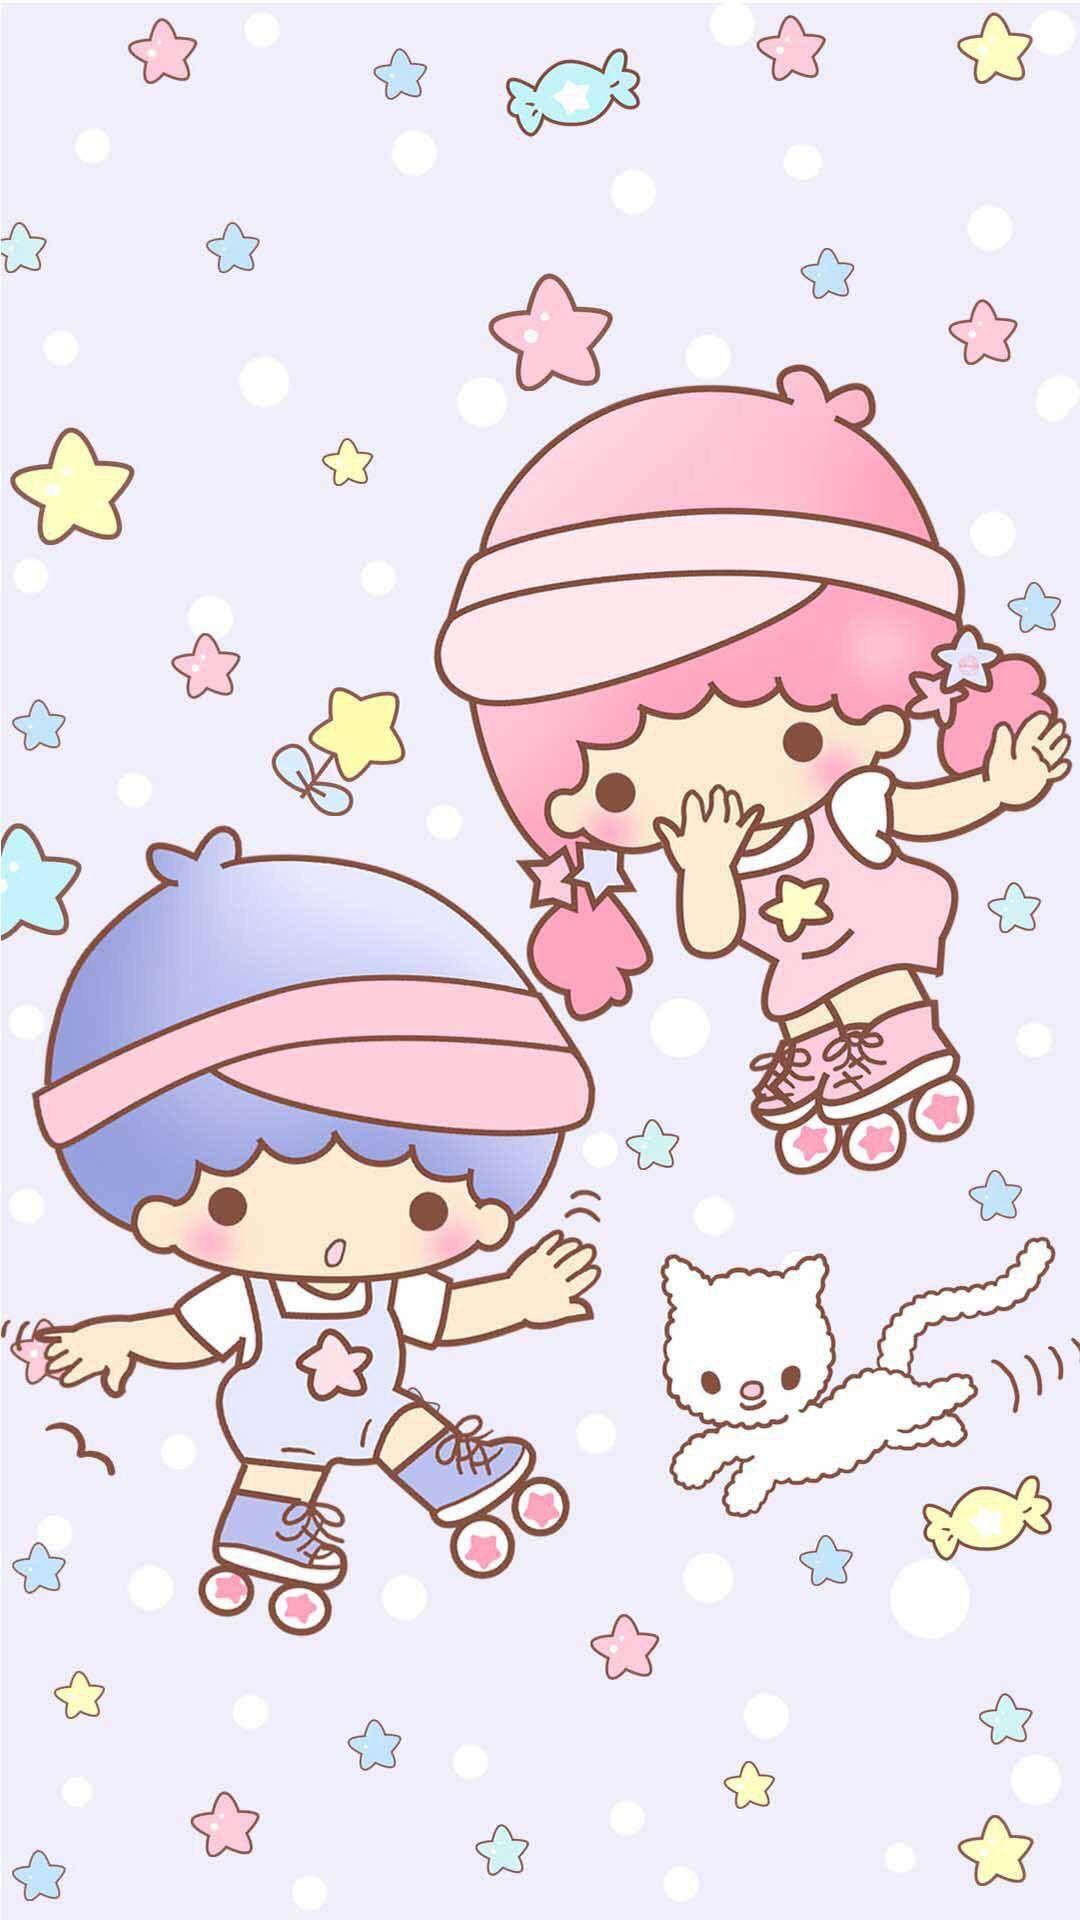 Sanrio Characters Little Twin Stars - HD Wallpaper